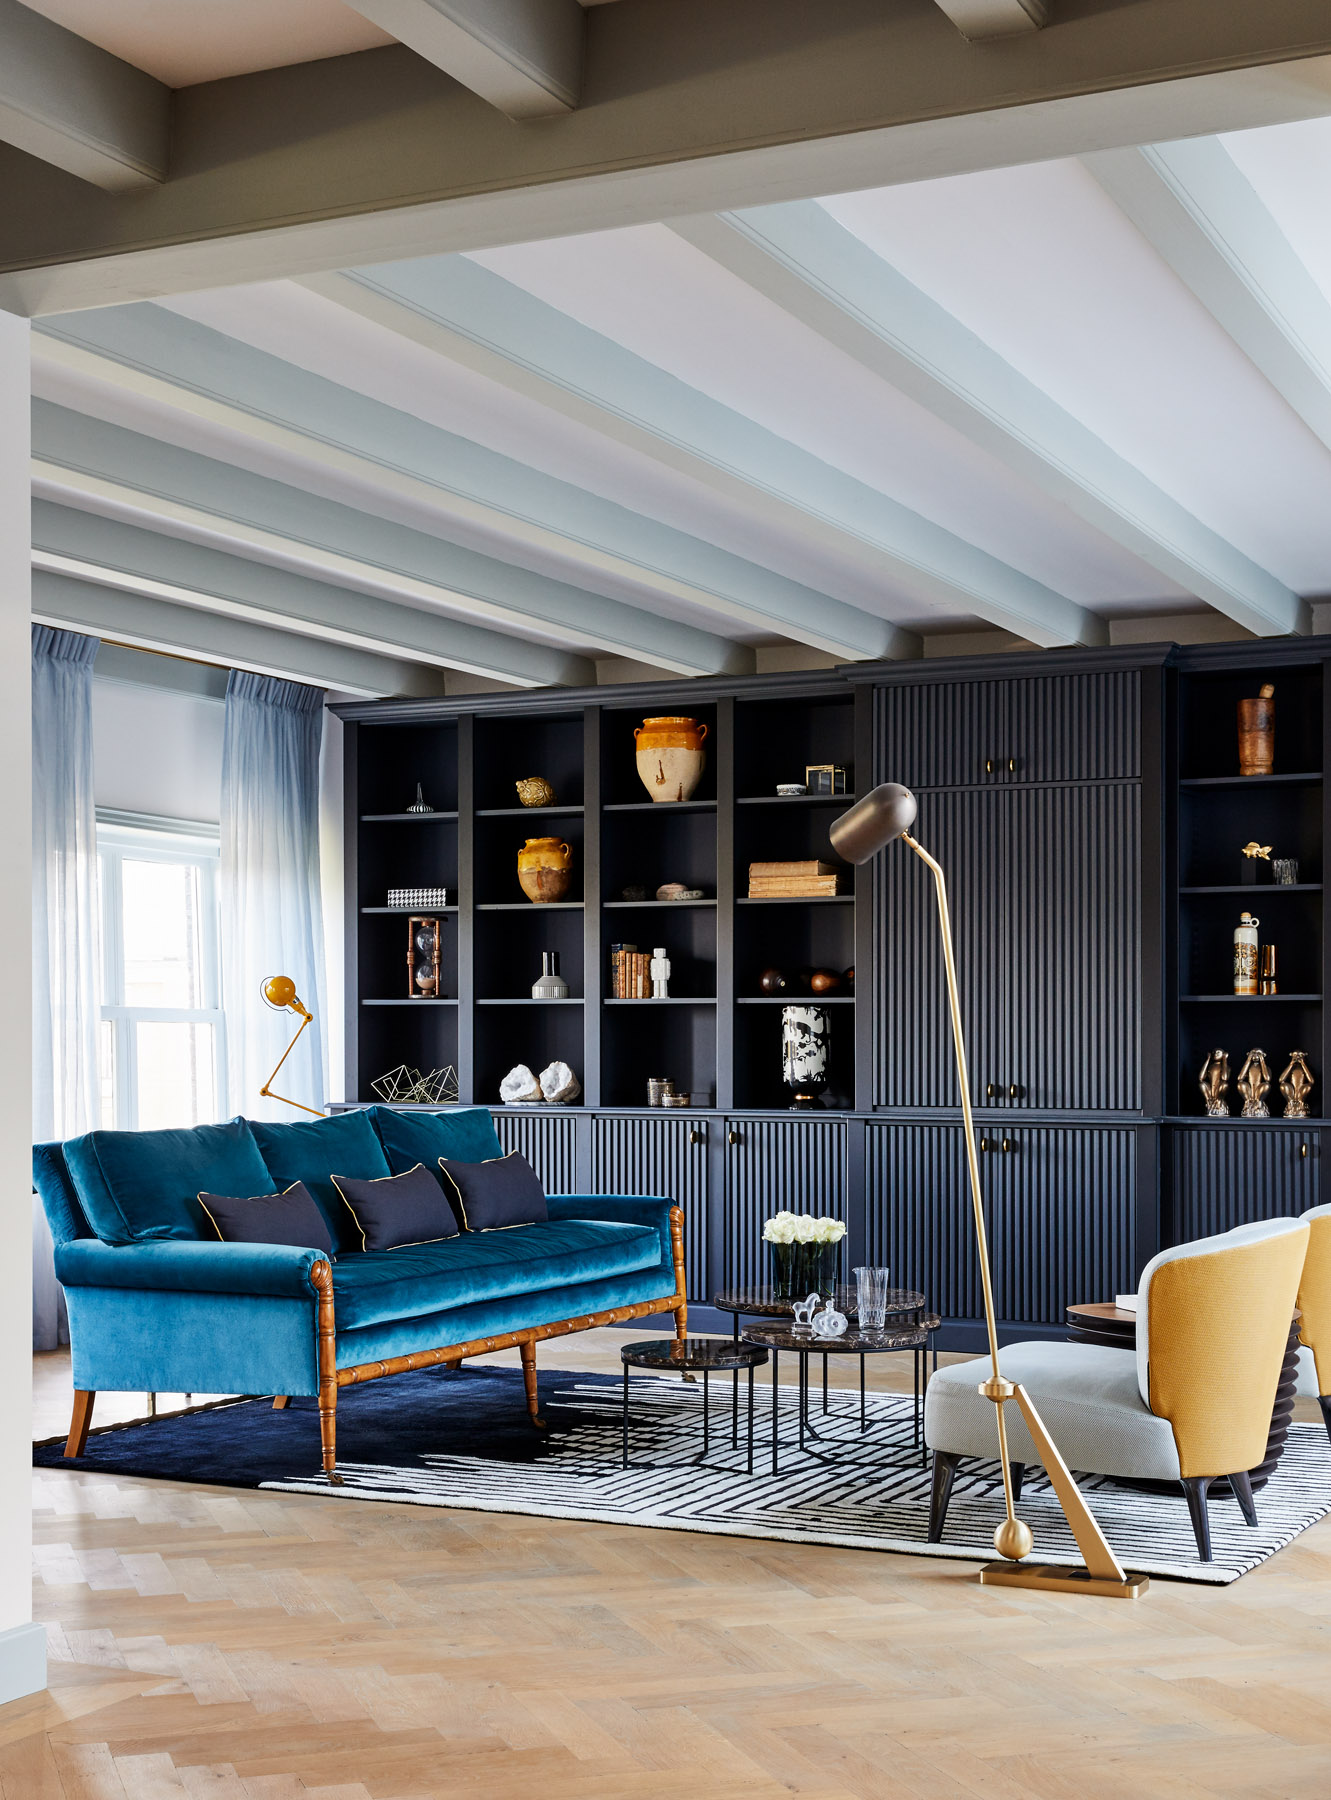 Interior Design Studio Amsterdam interior design studio amsterdam - bÜro kif